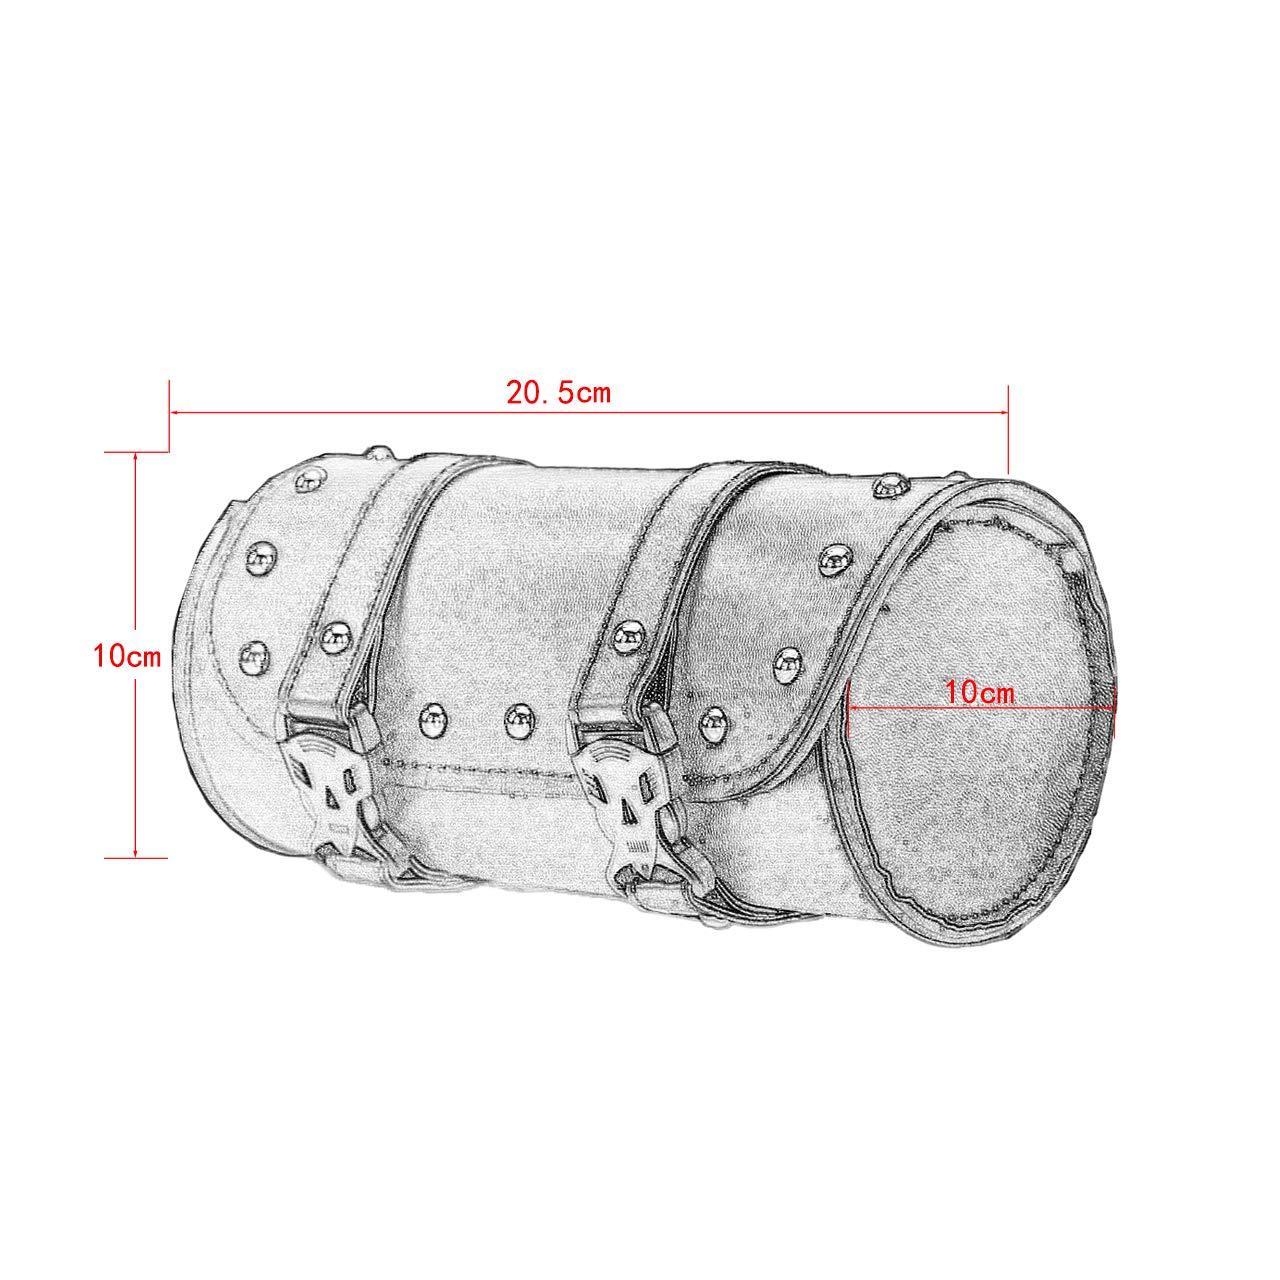 REBACKER Universal Motorcycle Handlebar Tool Front Fork Roll Storage Sissy Bar Barrel Bag PU Leather Deep Brown